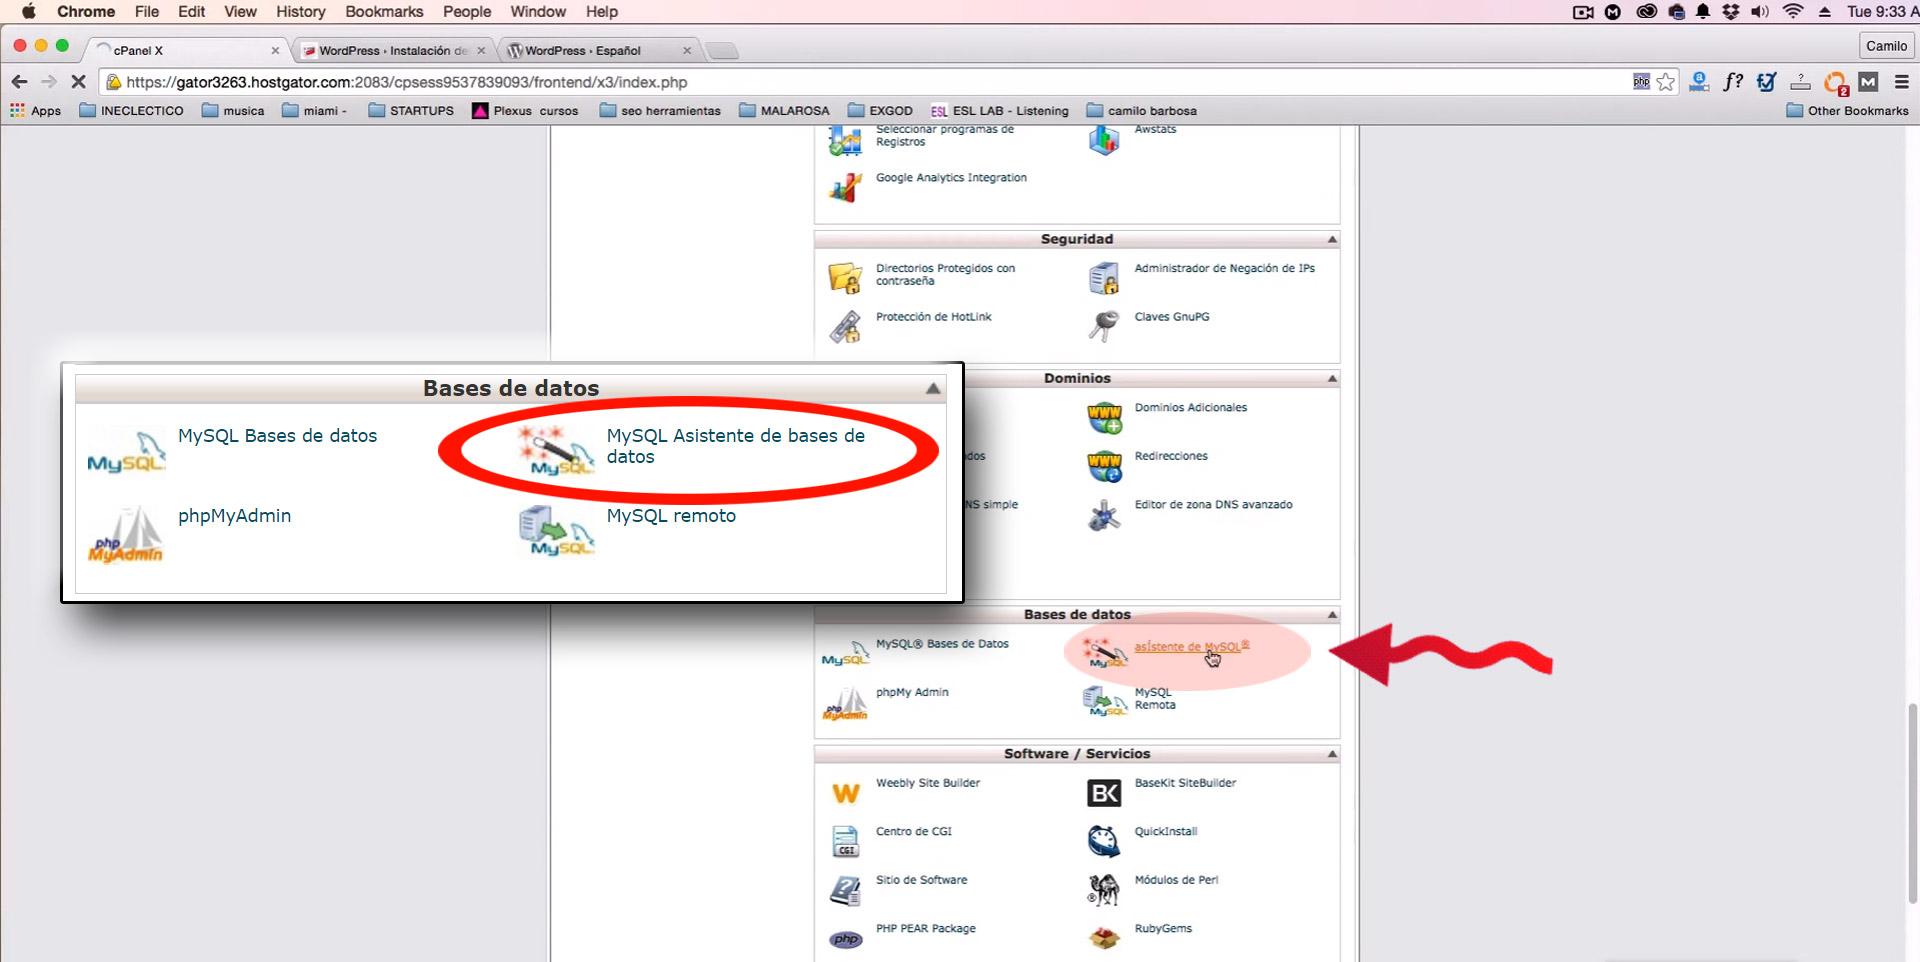 como instalar wordpress desde cpanel - EVOGRAF